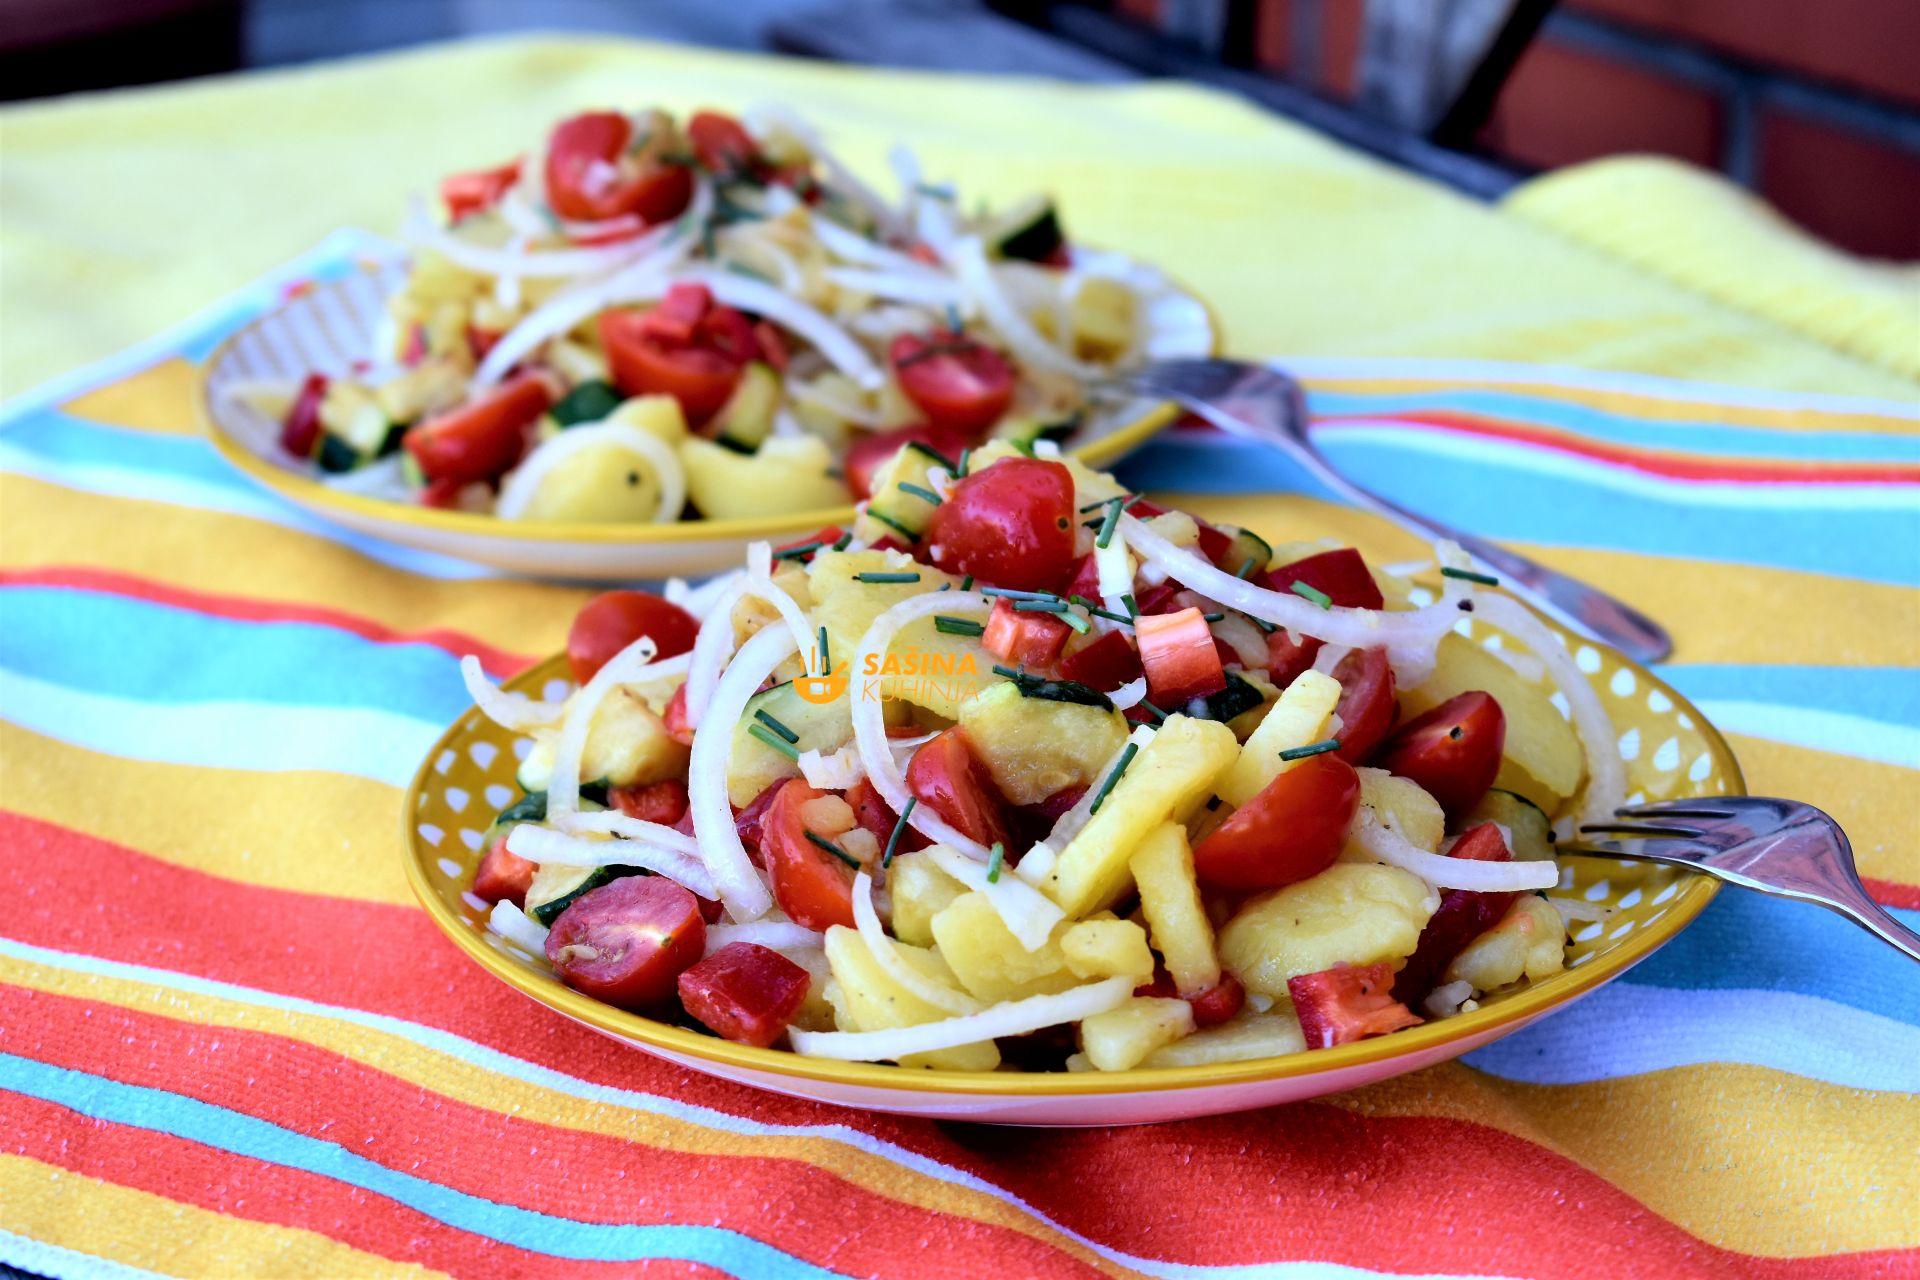 krumpir salata s tikvicama recept